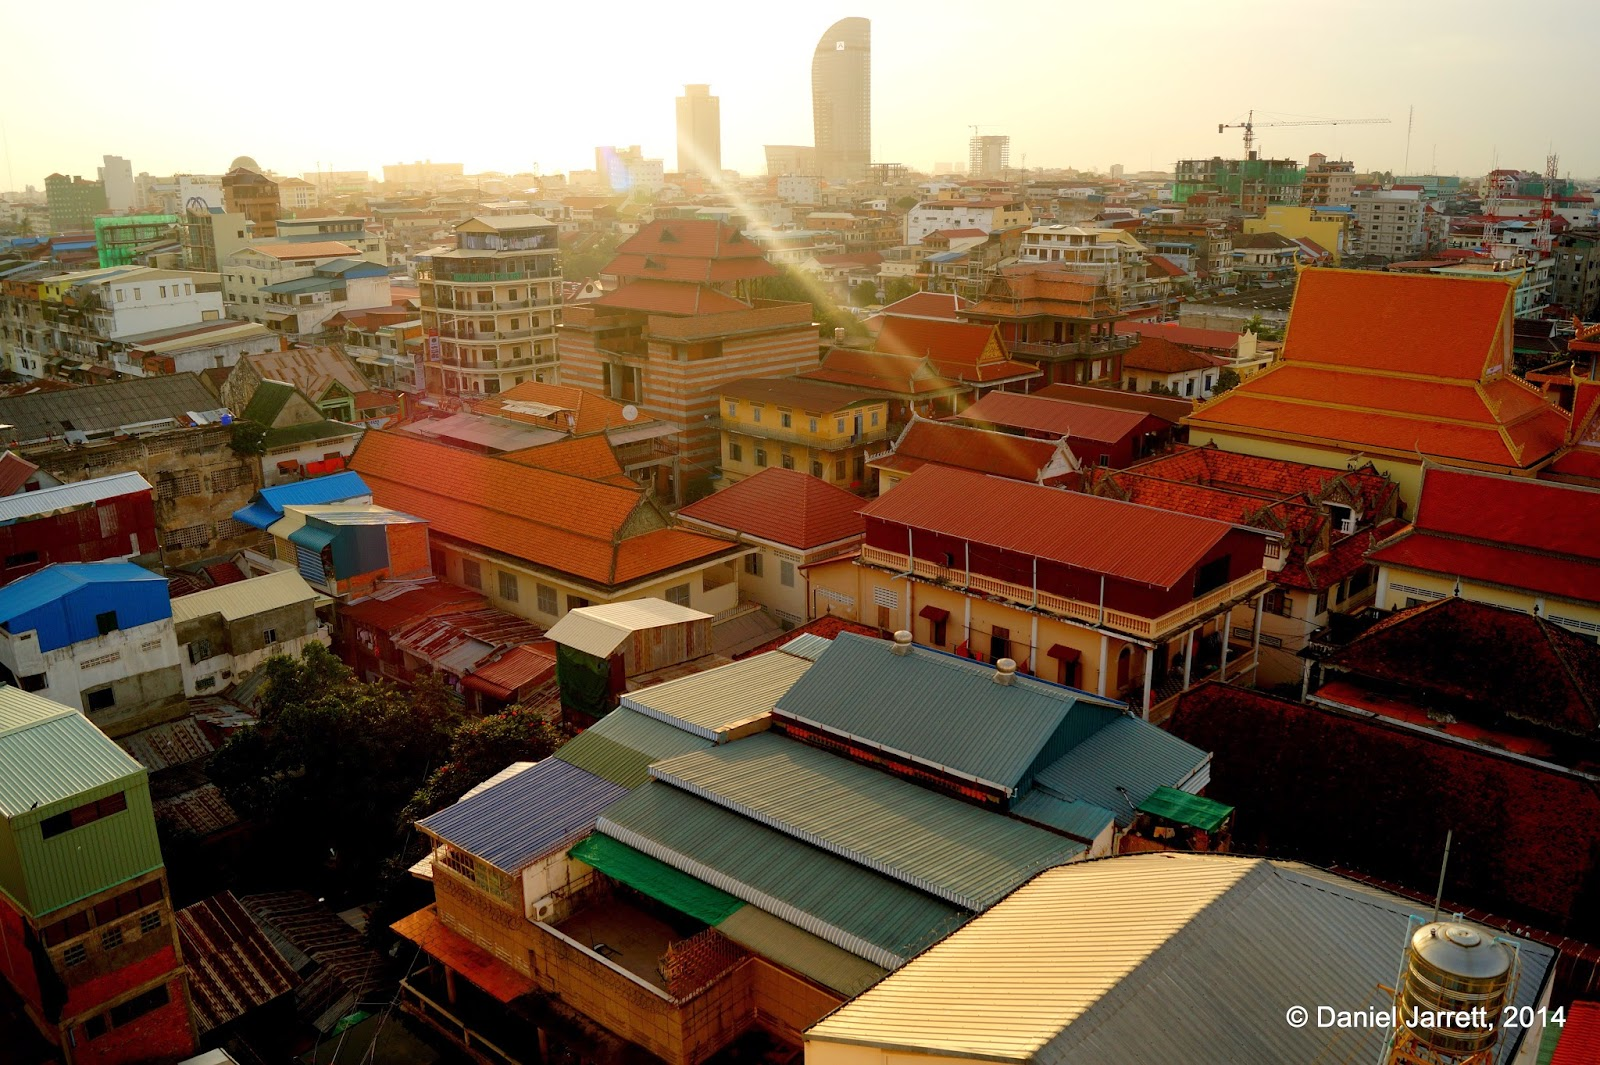 Rooftops of Phnom Penh, Cambodia